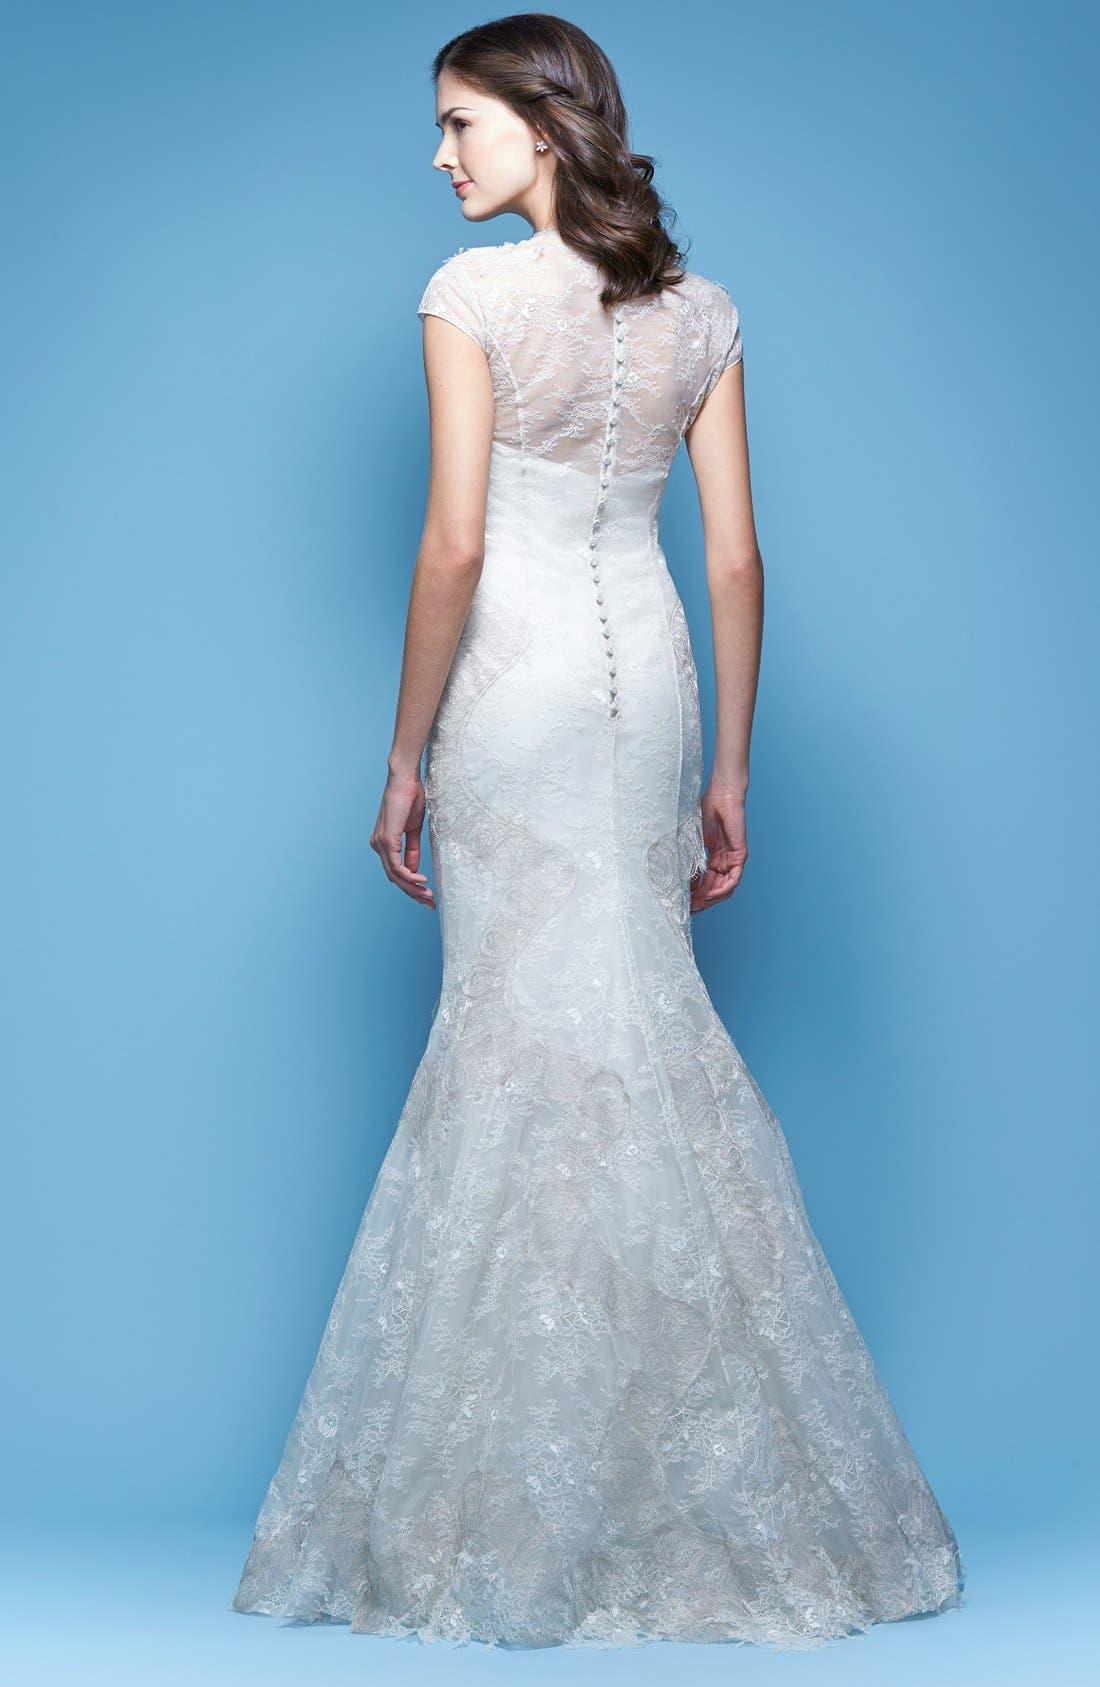 carolina herrera short wedding dresses » Wedding Dresses Designs ...